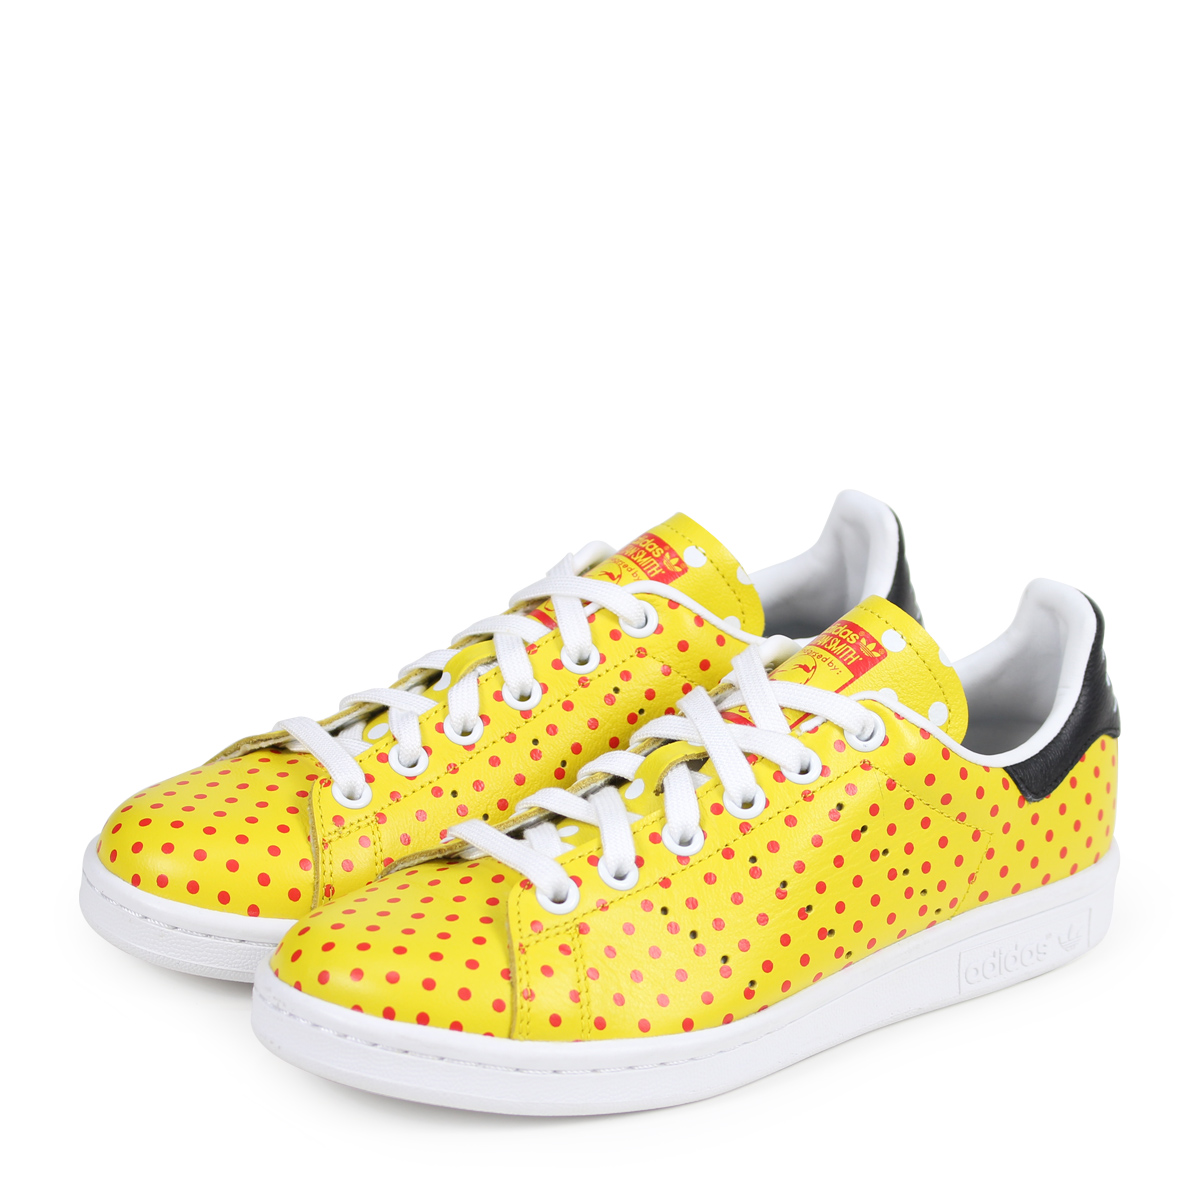 e9244fd612d8a ALLSPORTS  adidas Originals PW STAN SMITH SPD Adidas Stan Smith ...